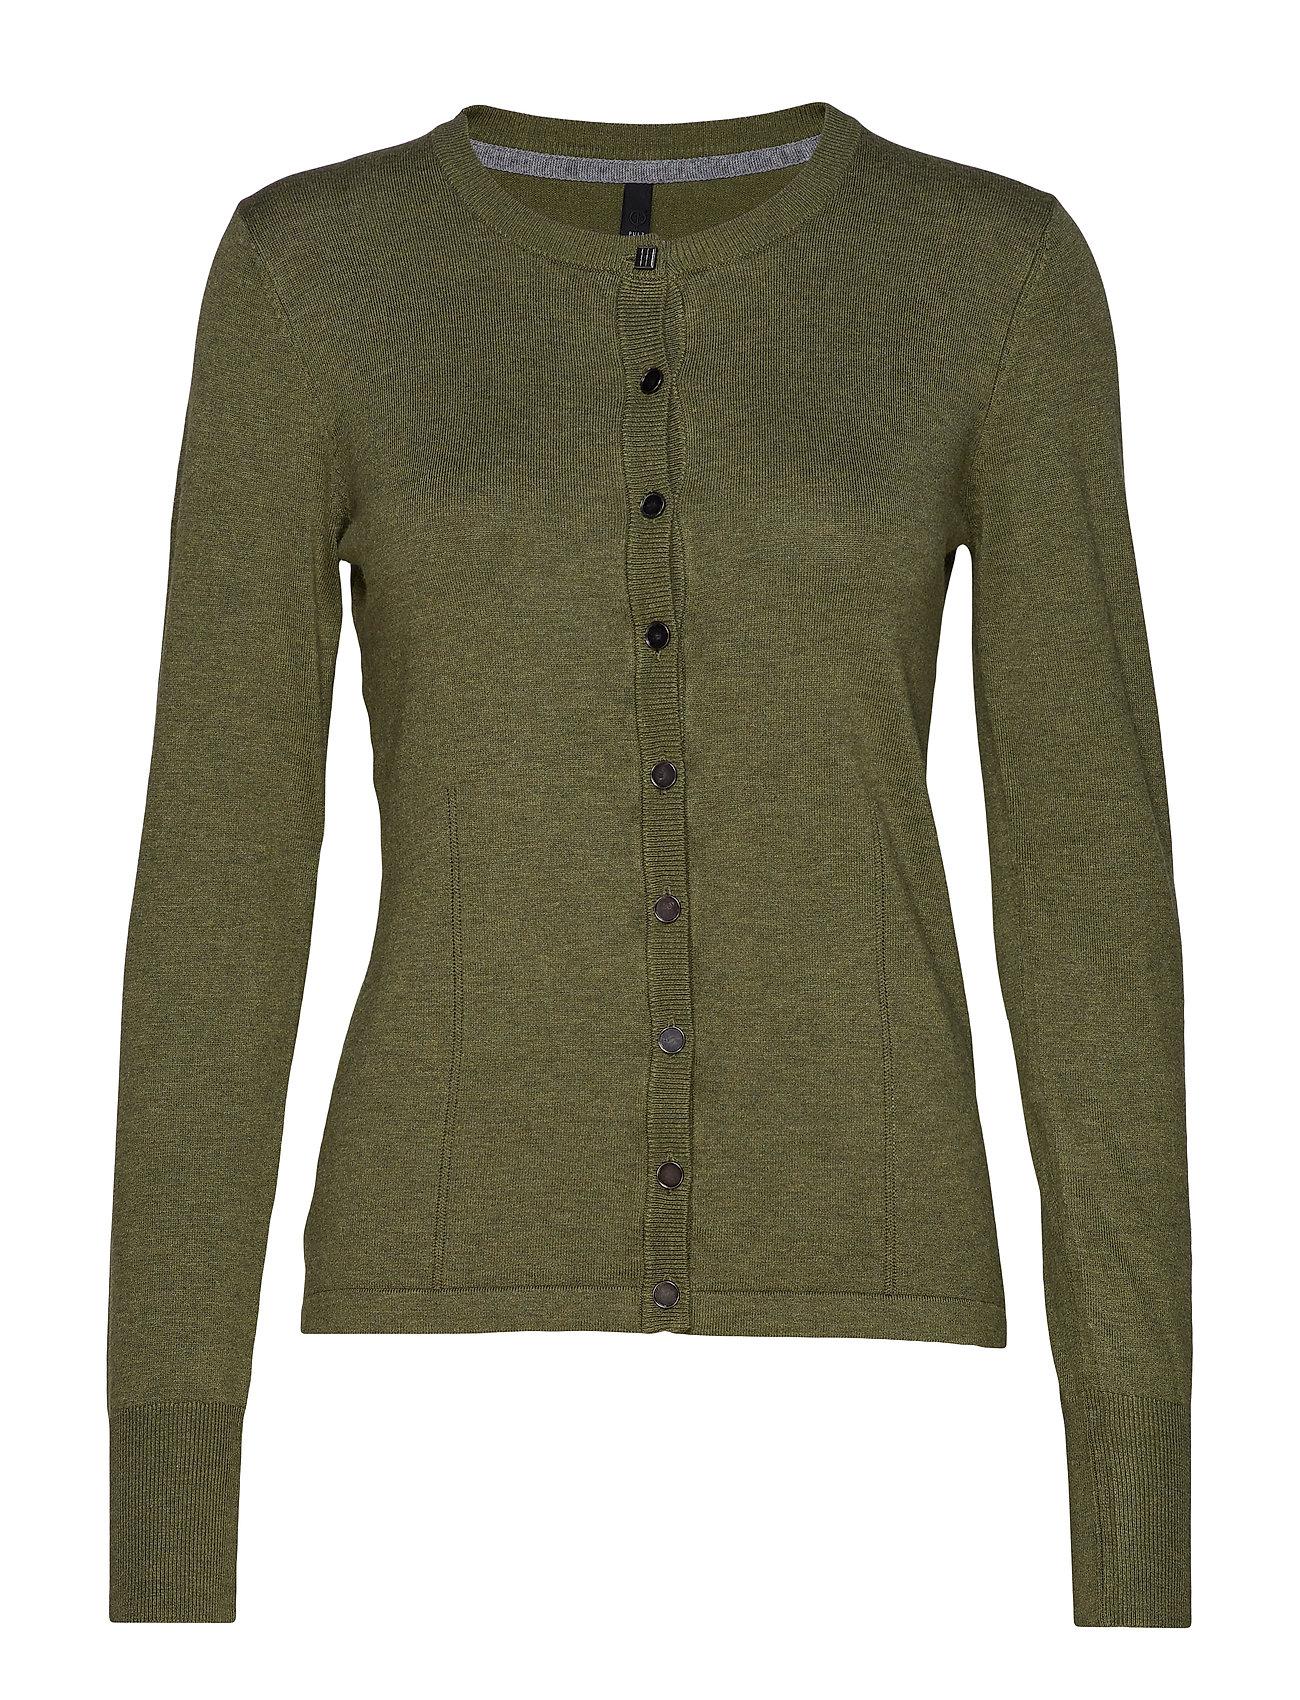 GreenPulz s L Cardigancrocodile Pzsara Jeans 7ygYf6bv